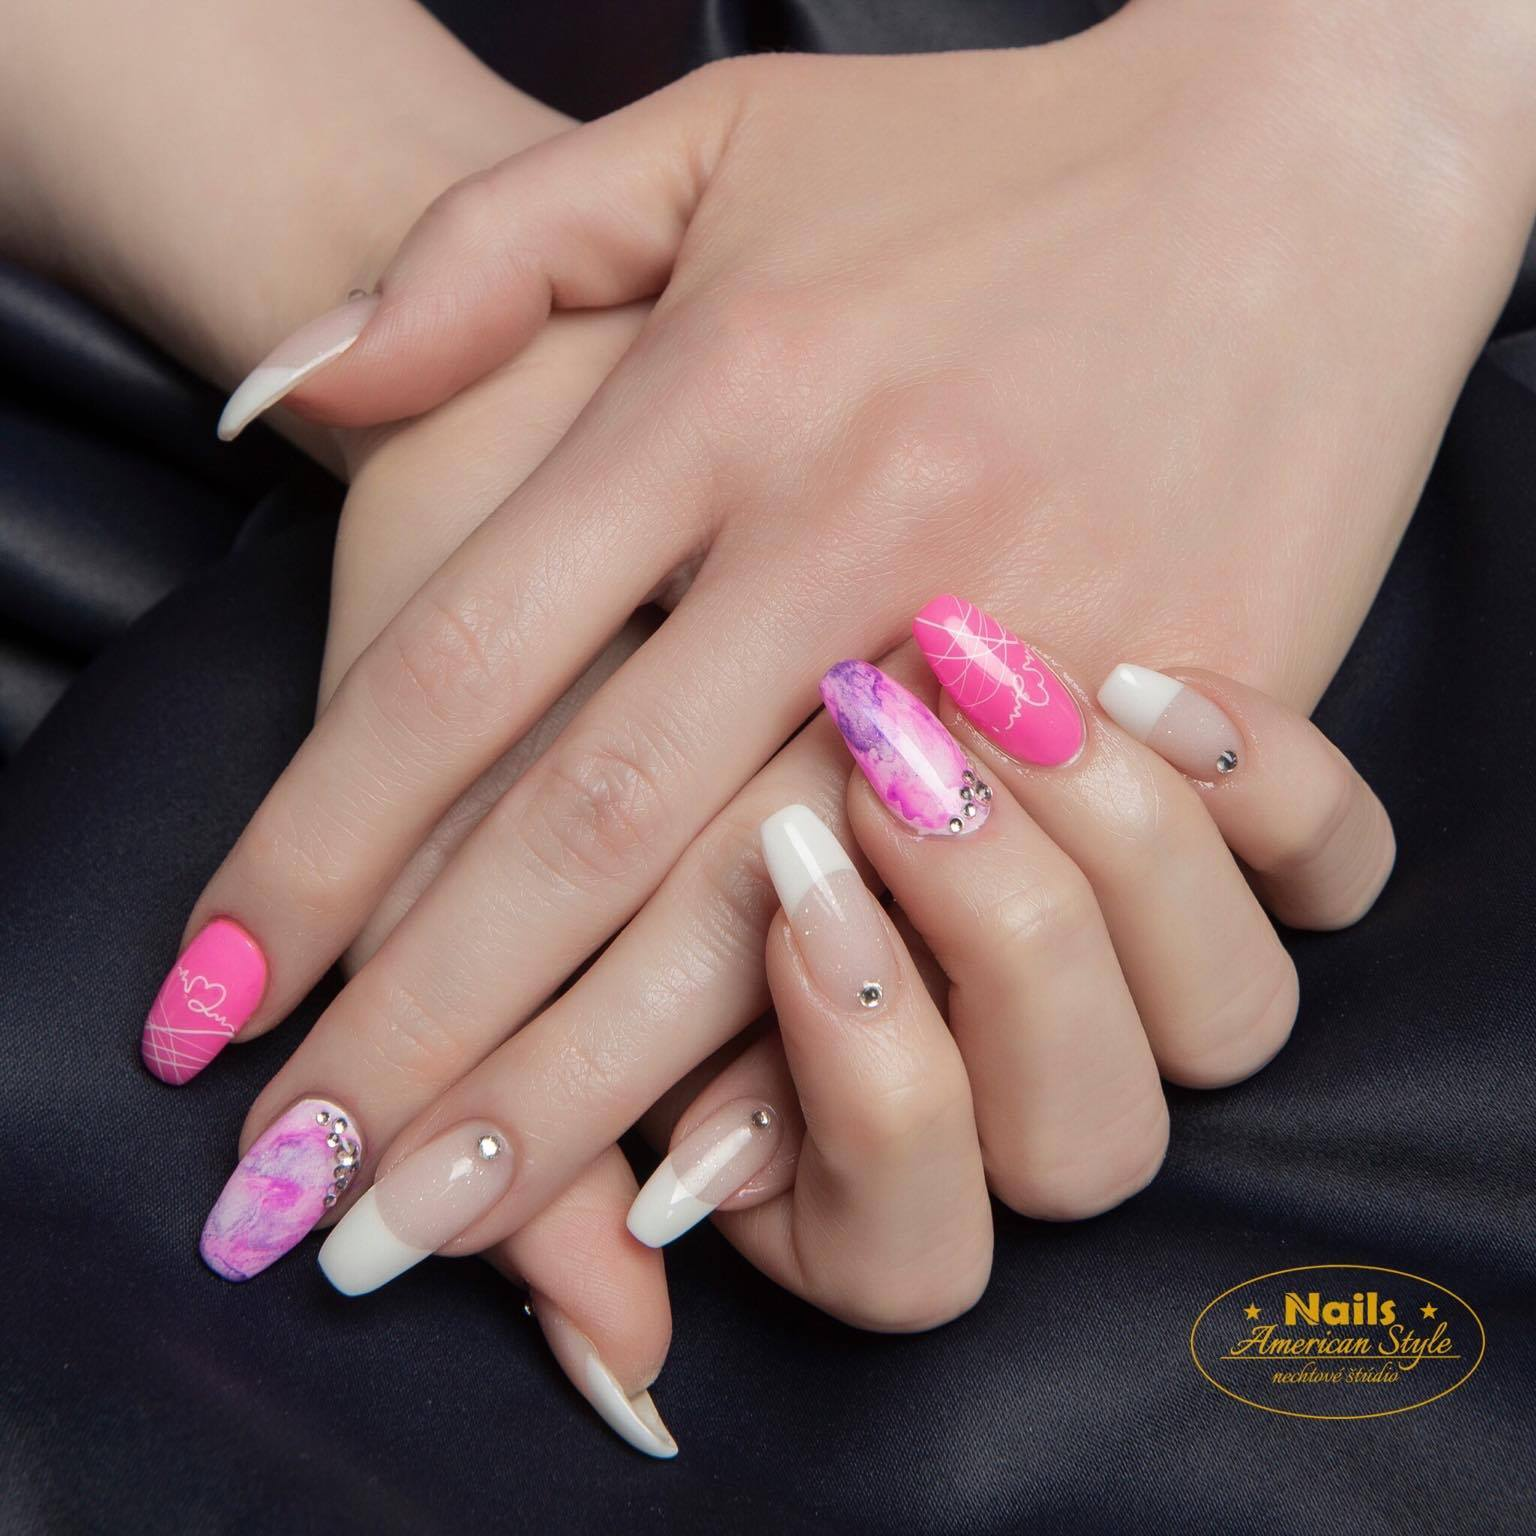 Nails American Style Manikúra Pedikura Nechty Bratislava